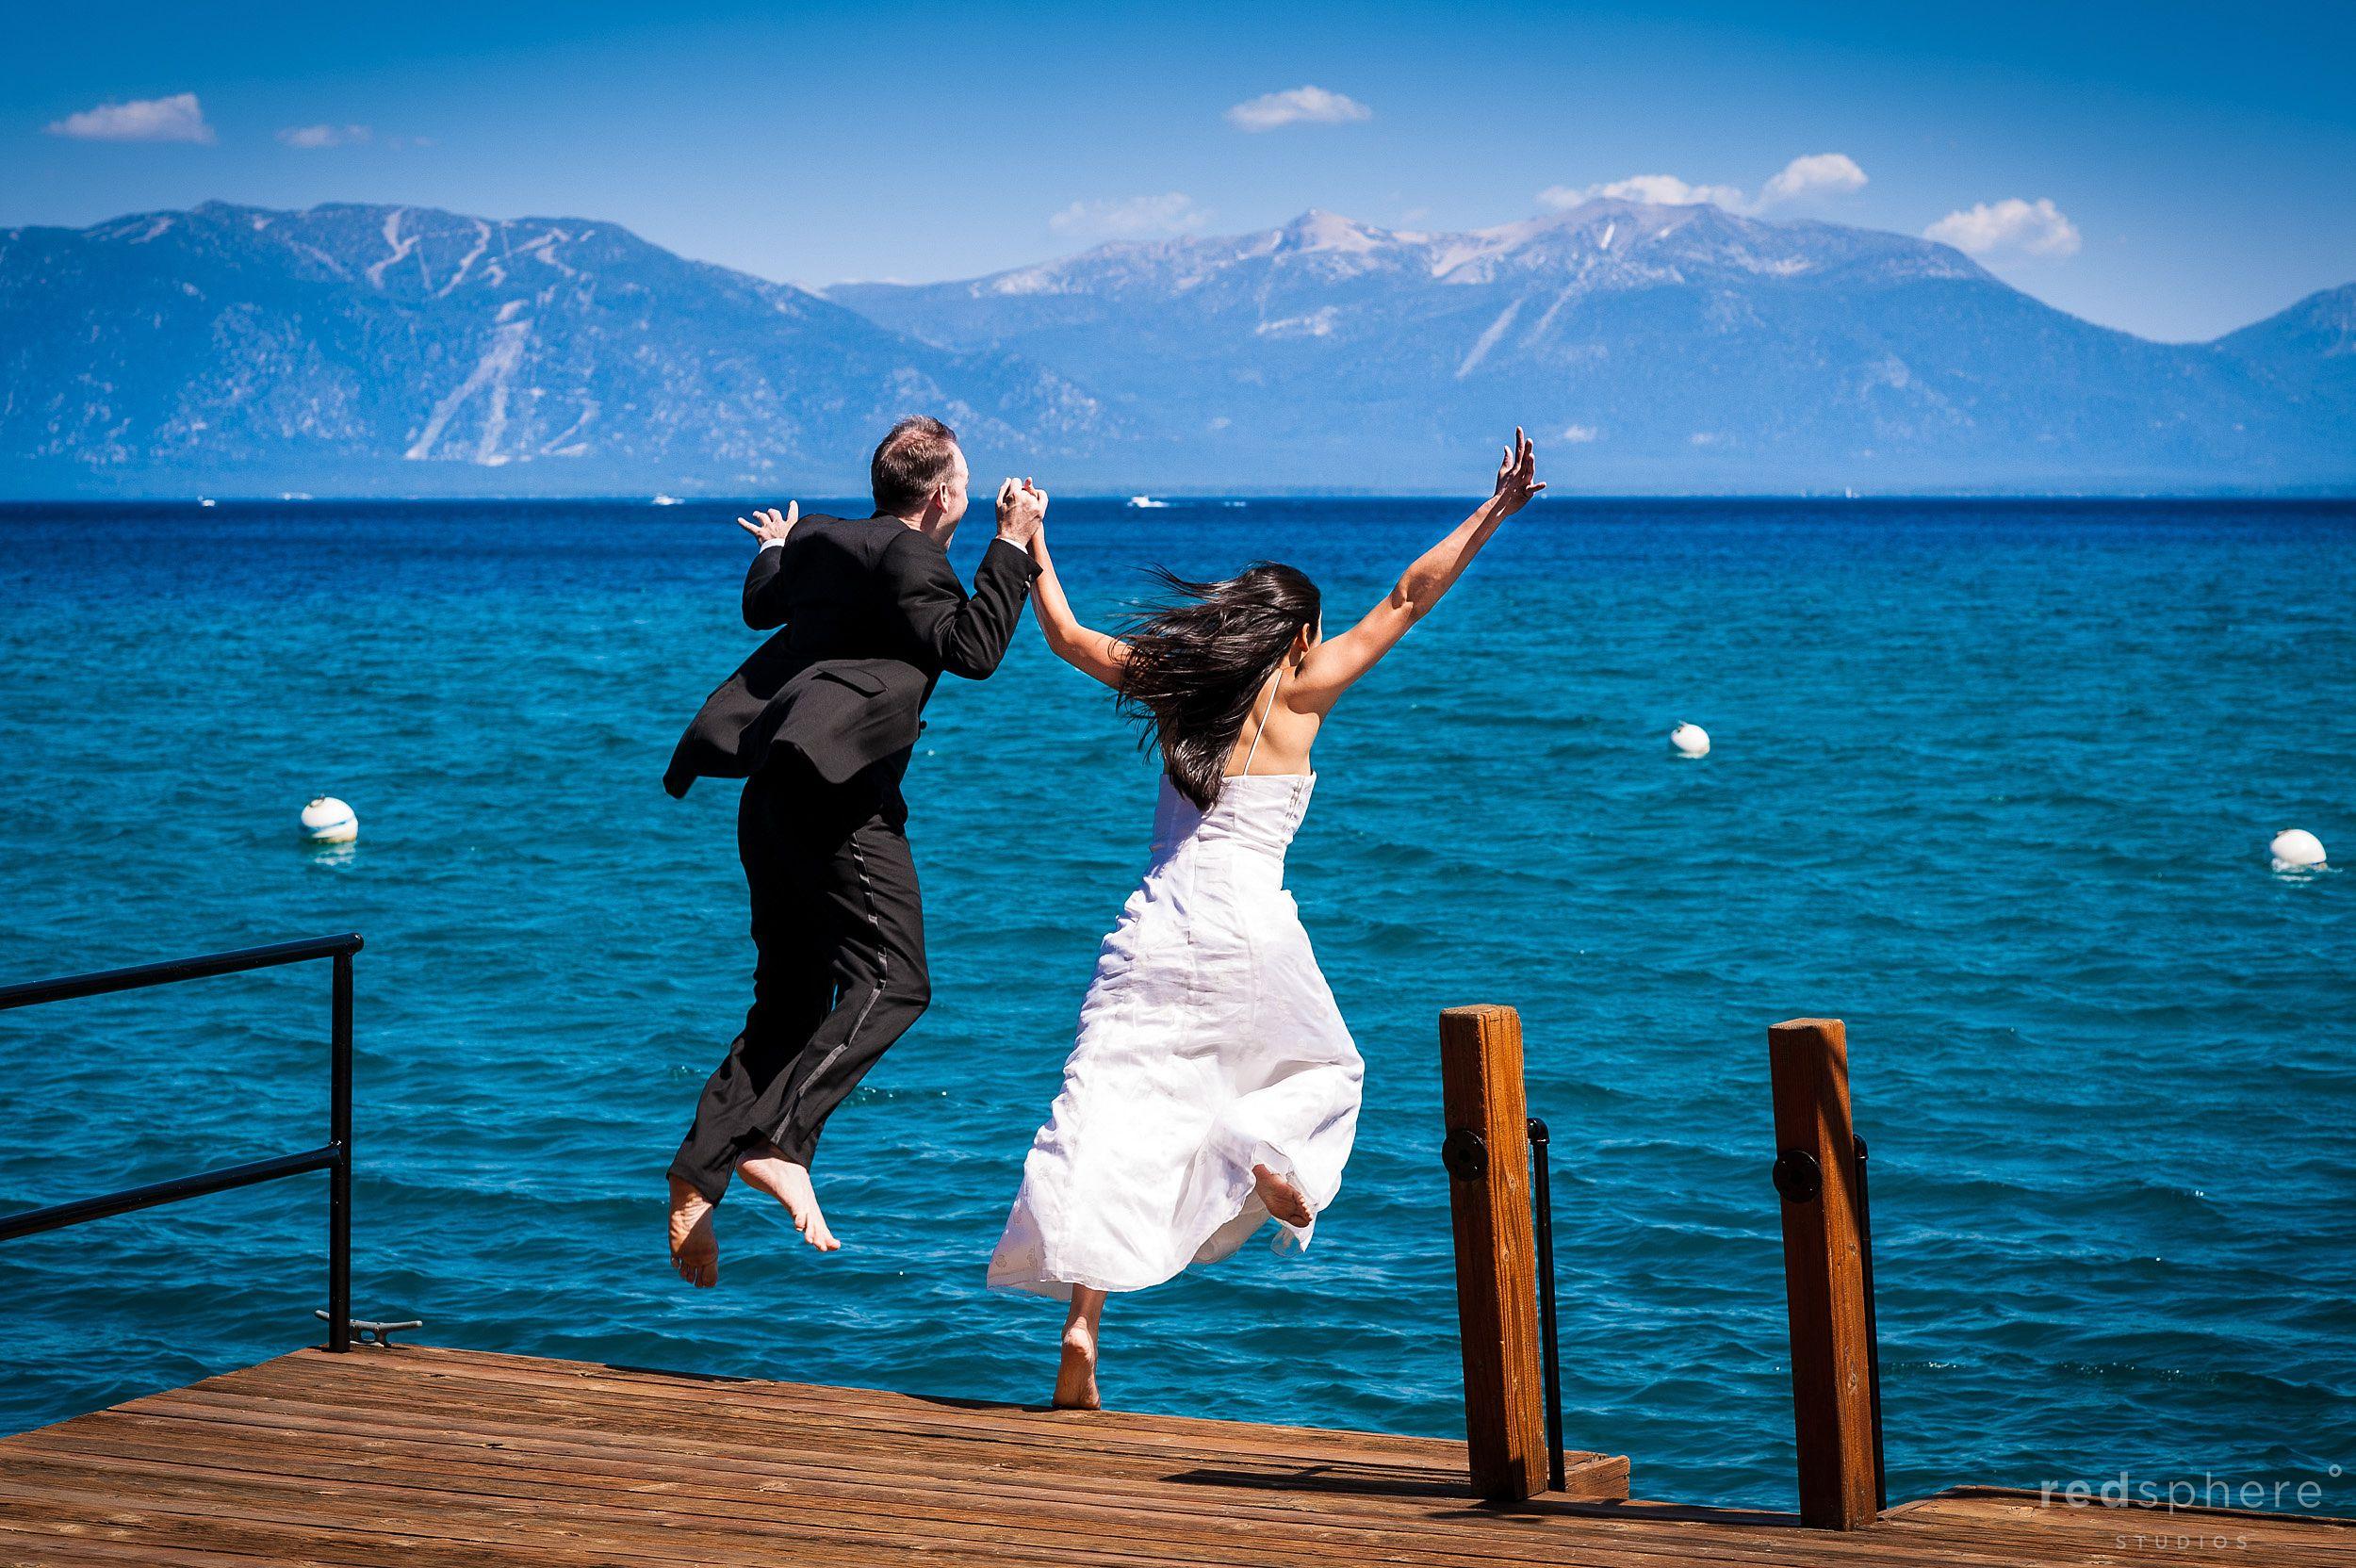 Couple Jump of Dock at Lake Tahoe, Fun Engagement Sessions at Lake Tahoe